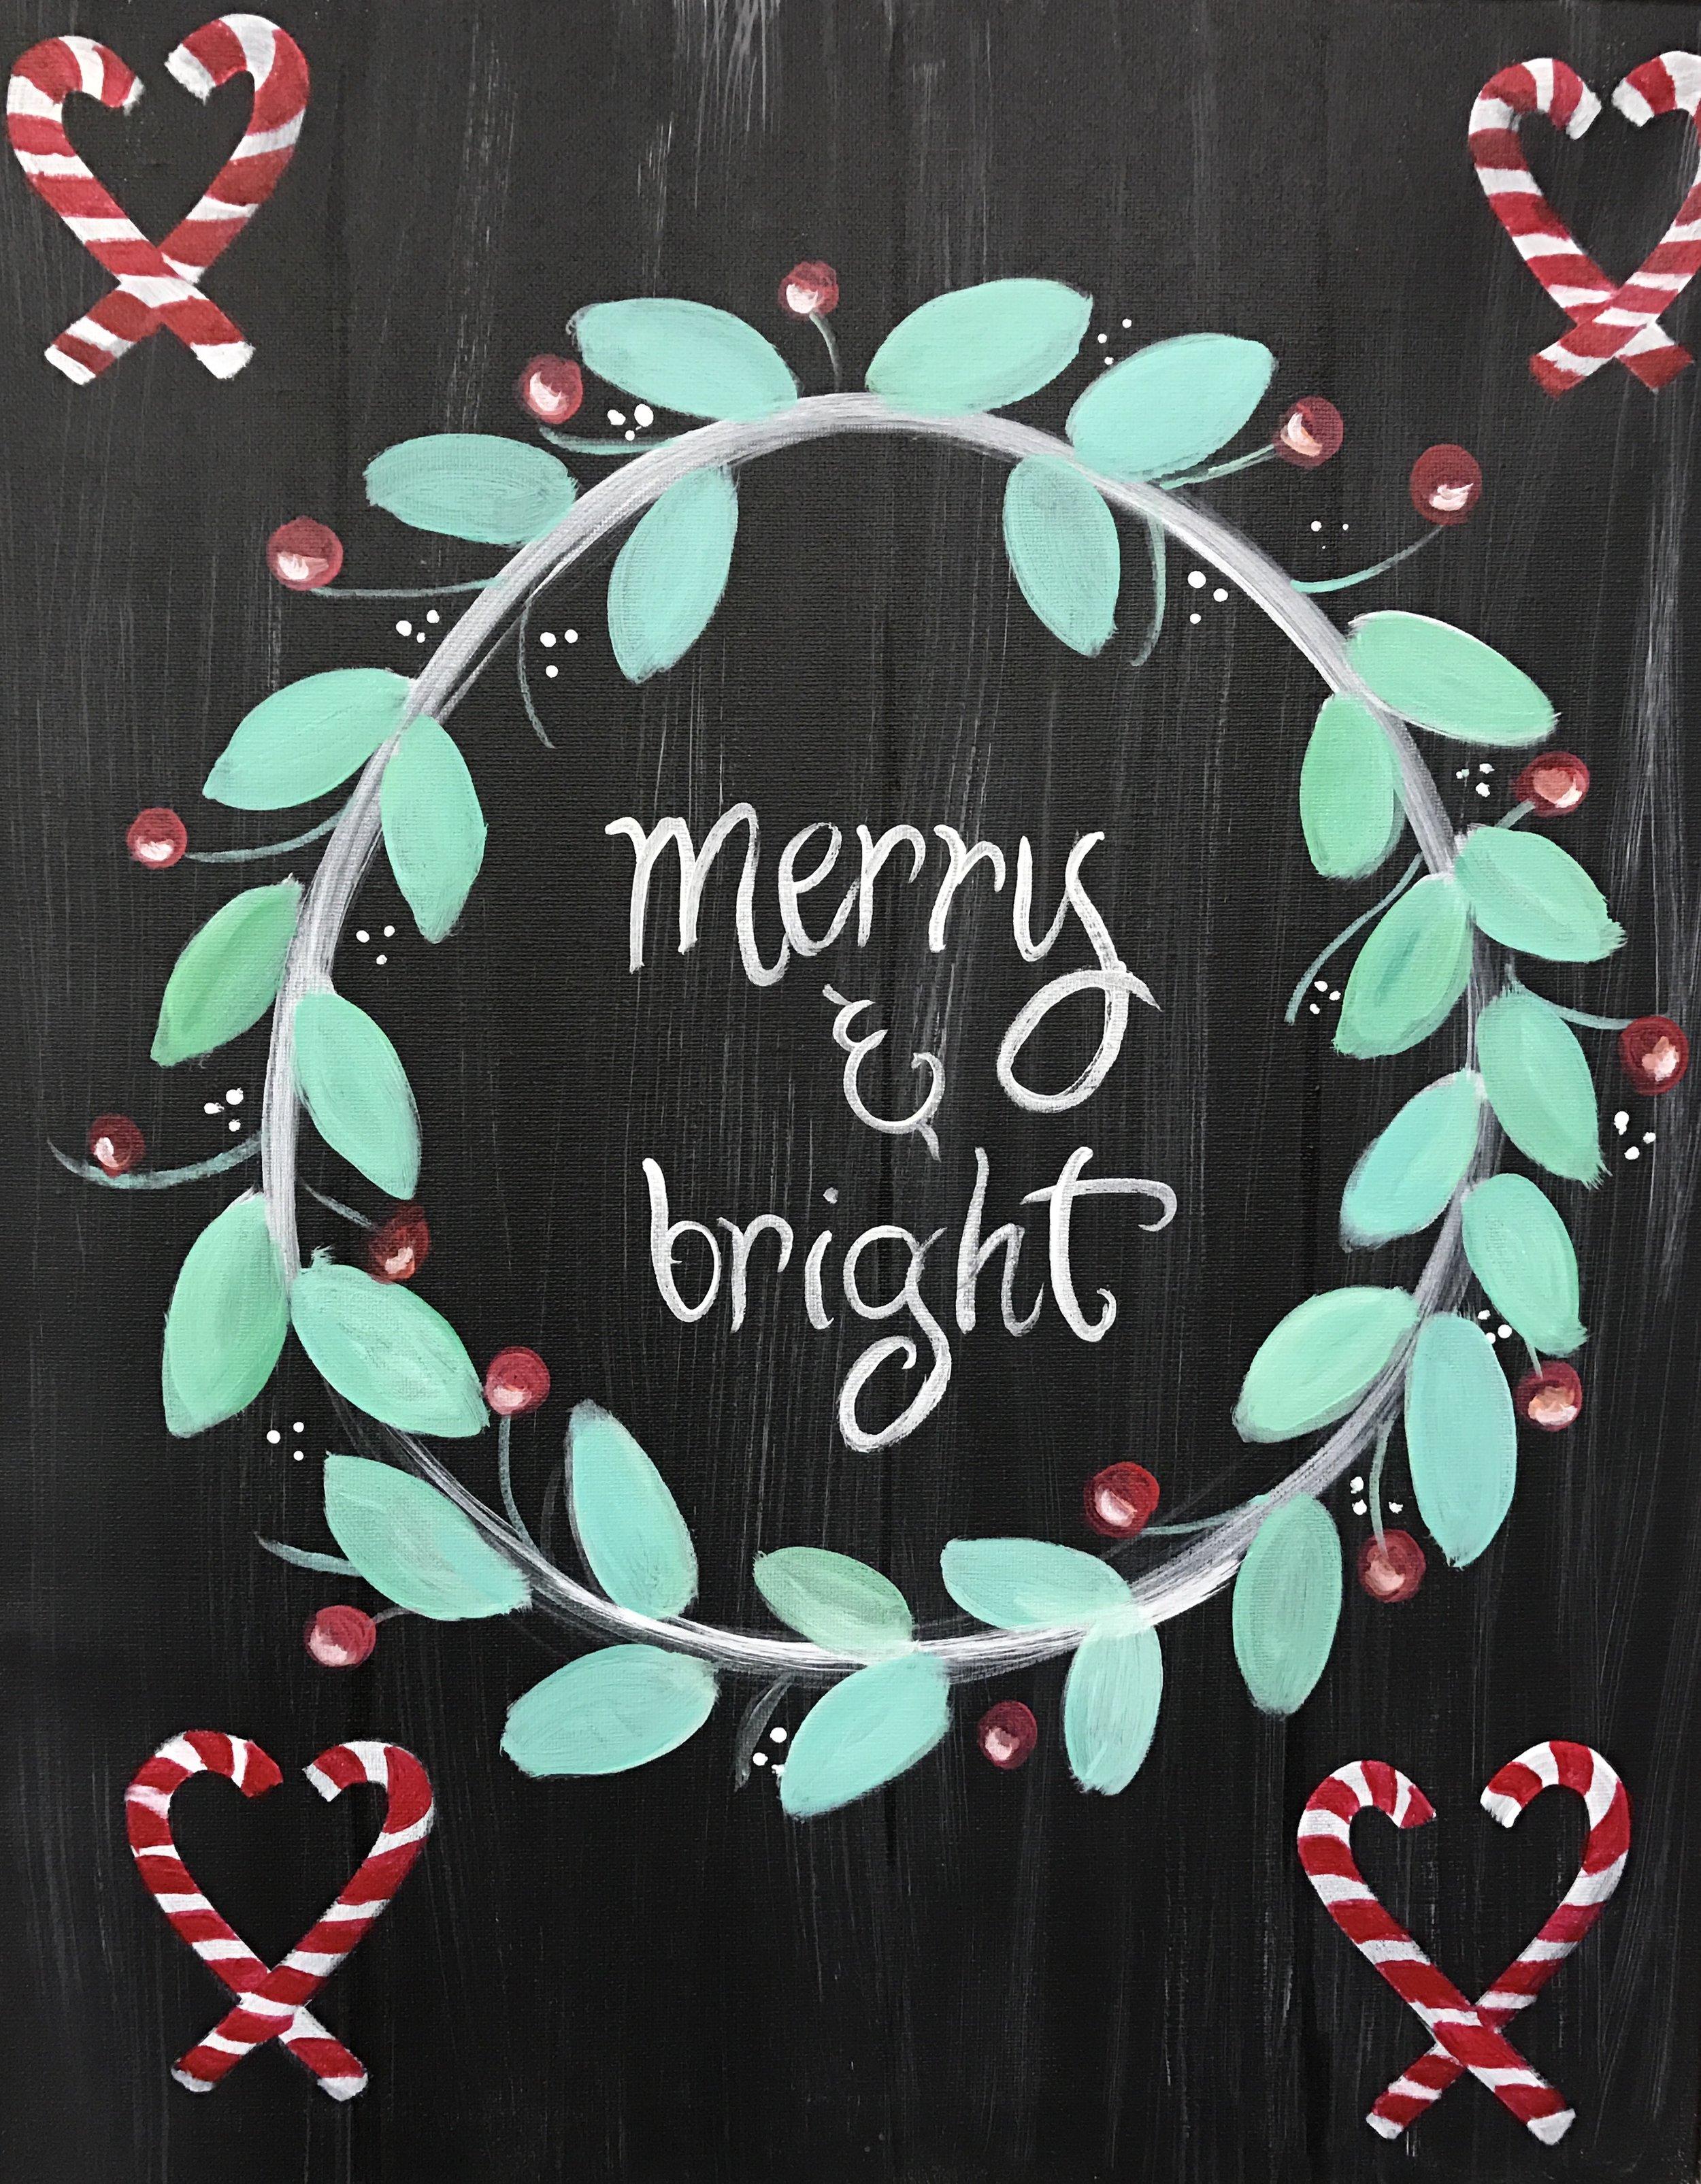 Merry & Bright.jpg